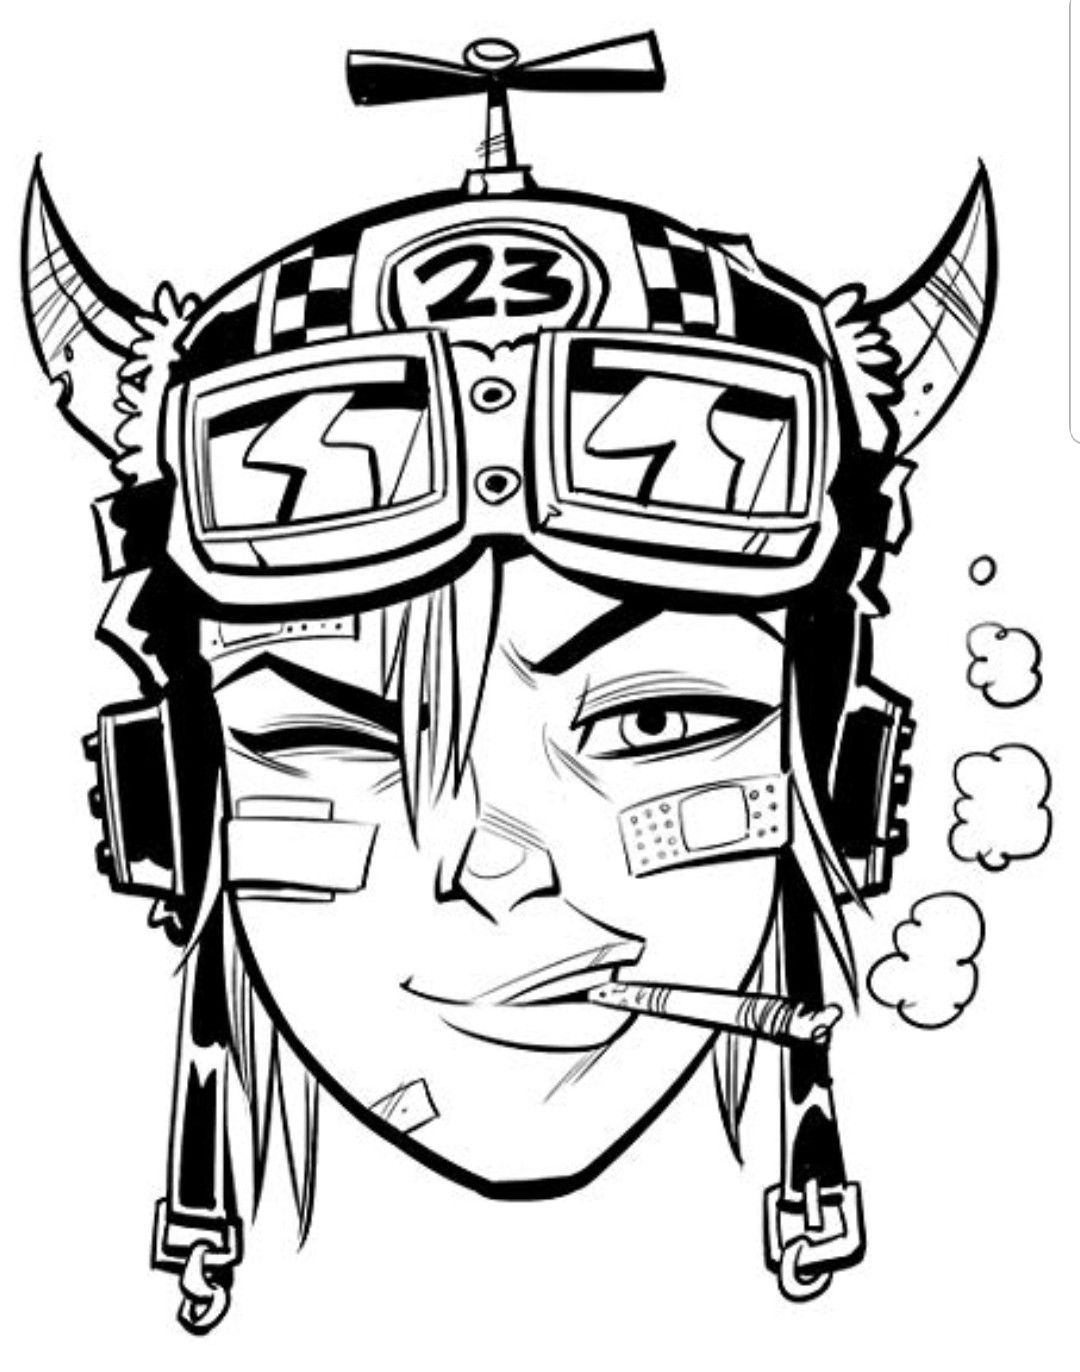 Pin by Ashley Marba on That's Rad Female comic